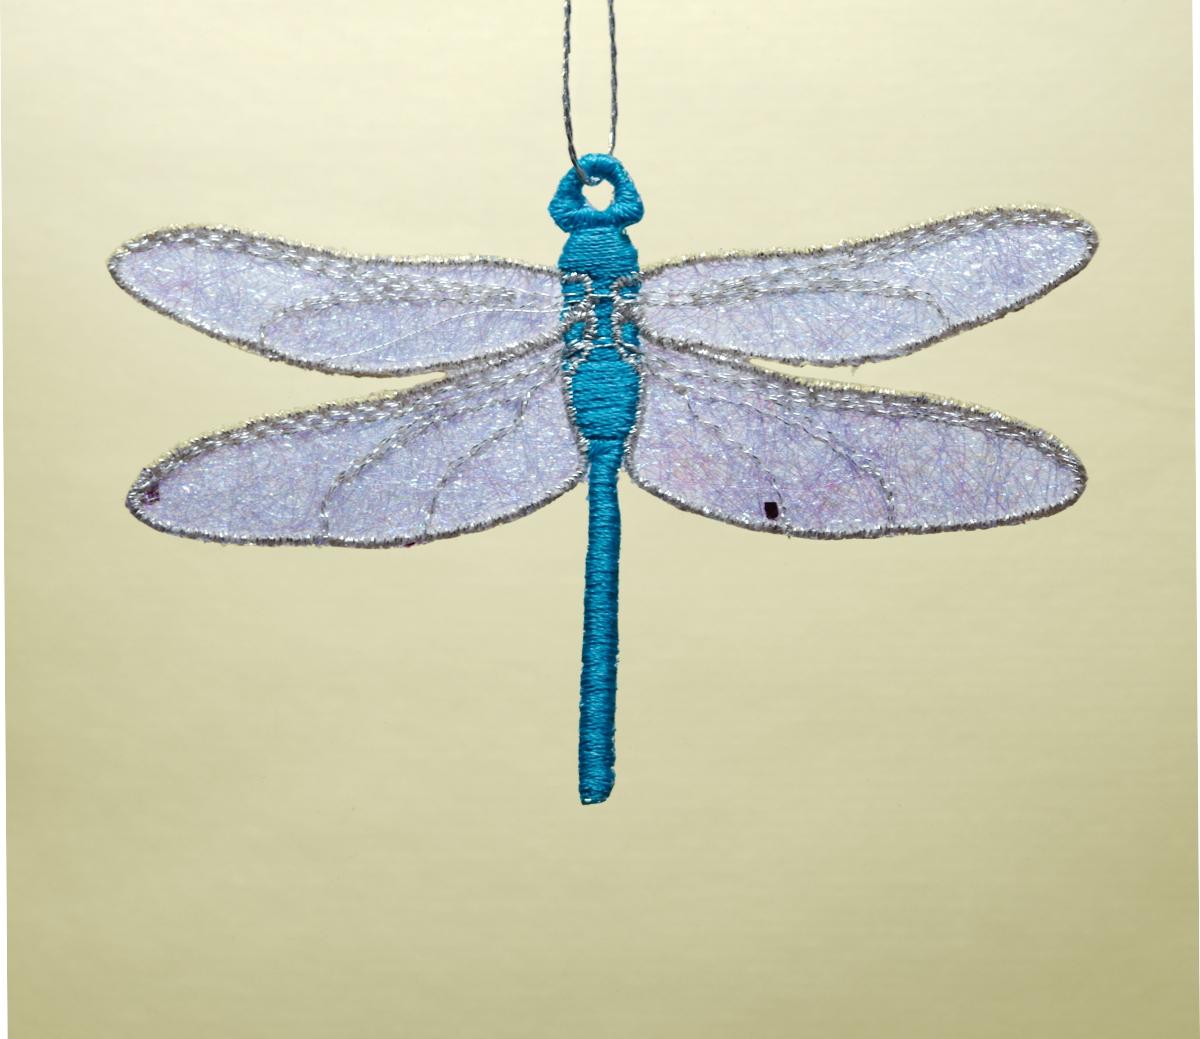 Dragonfly 1 Shimmer